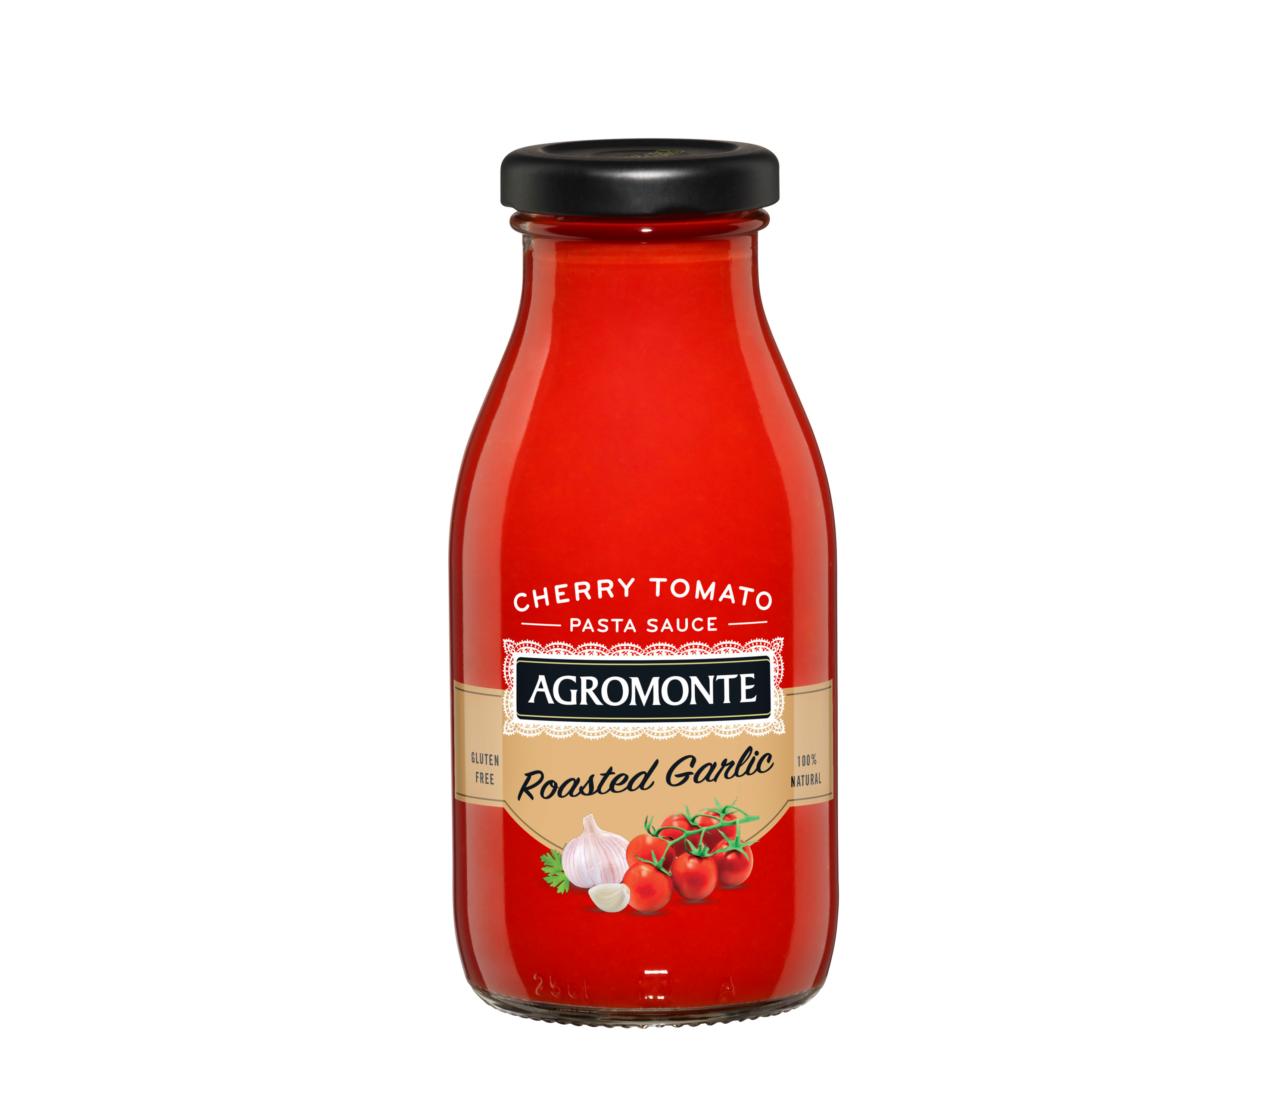 Agromonte_Cherry_Tomato_Roasted_Garlic__Aglio__Pasta_Sauce_-_260g